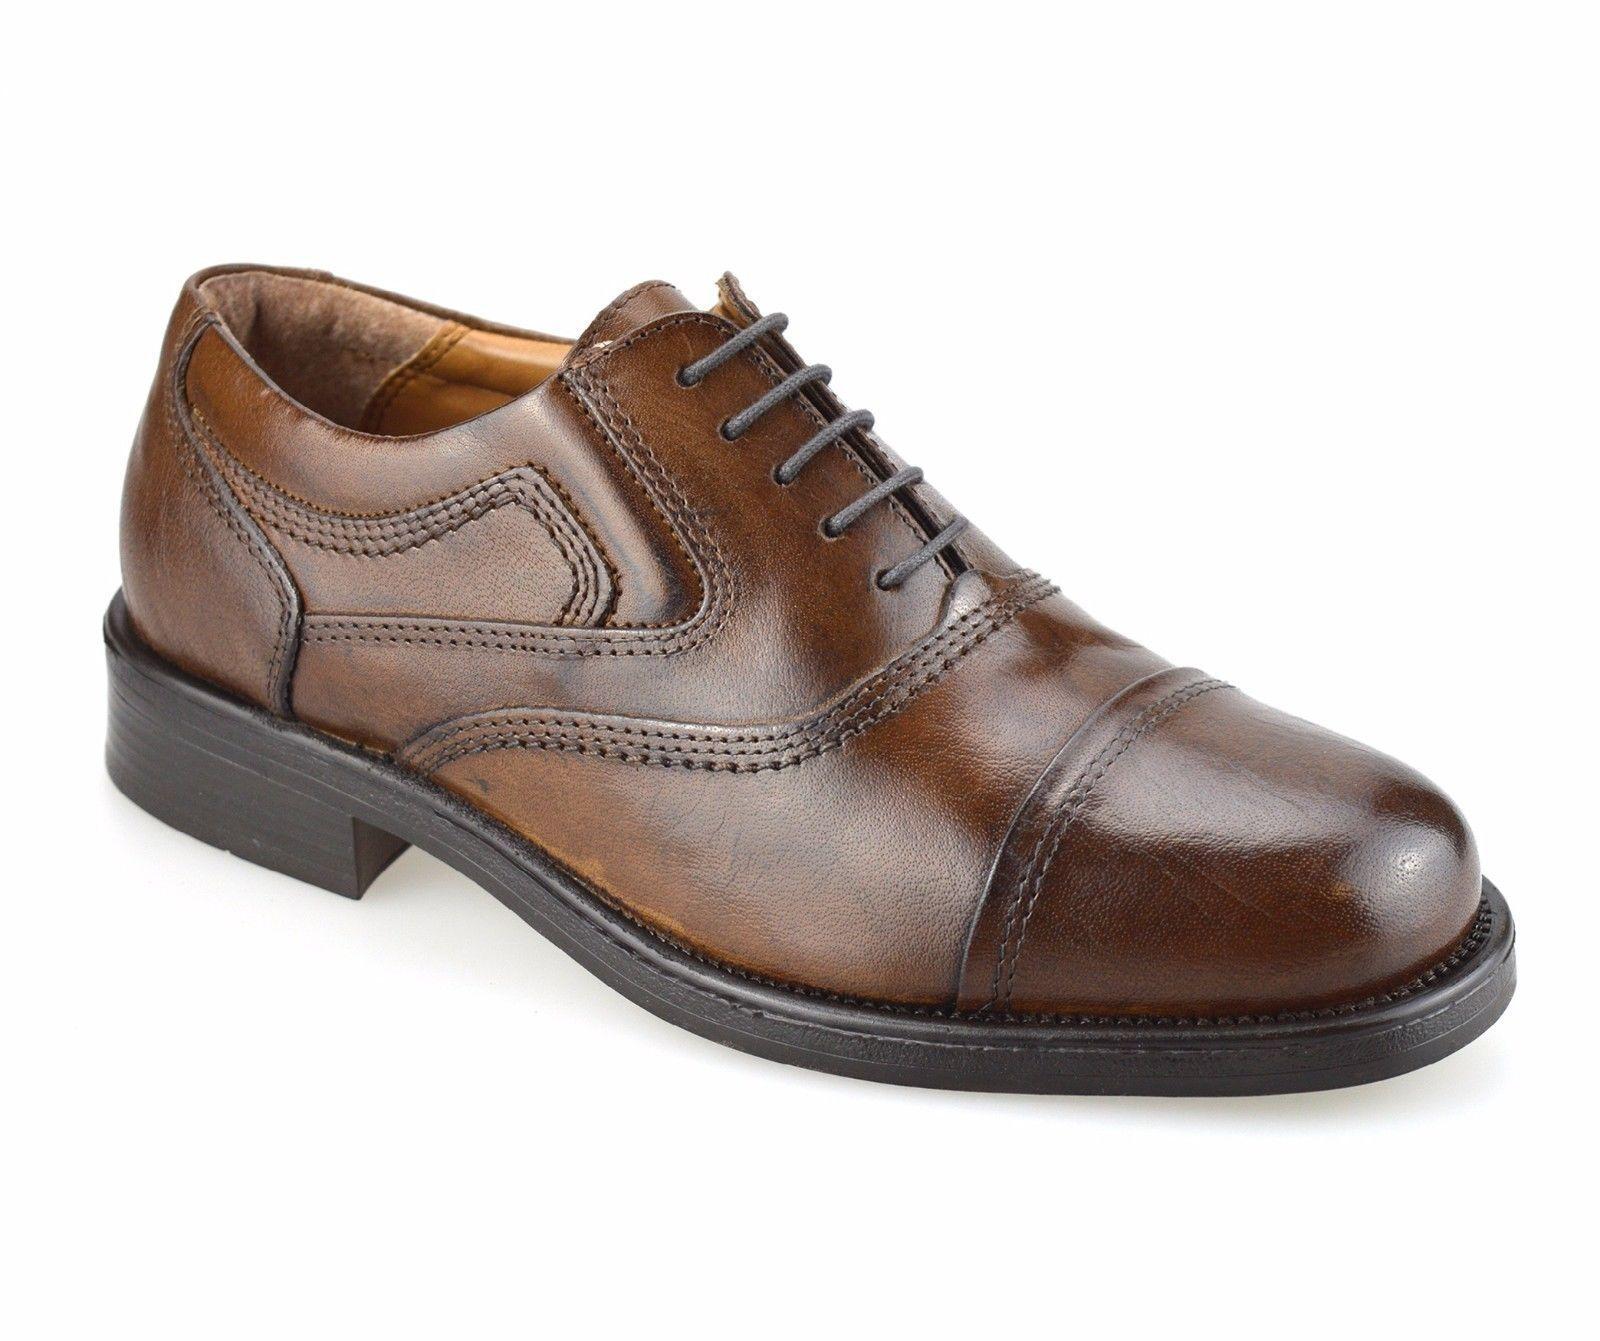 Herren Halbschuhe Schuhe Leder 1485-6 Außen Slipper Freizeitschuhe 41-47